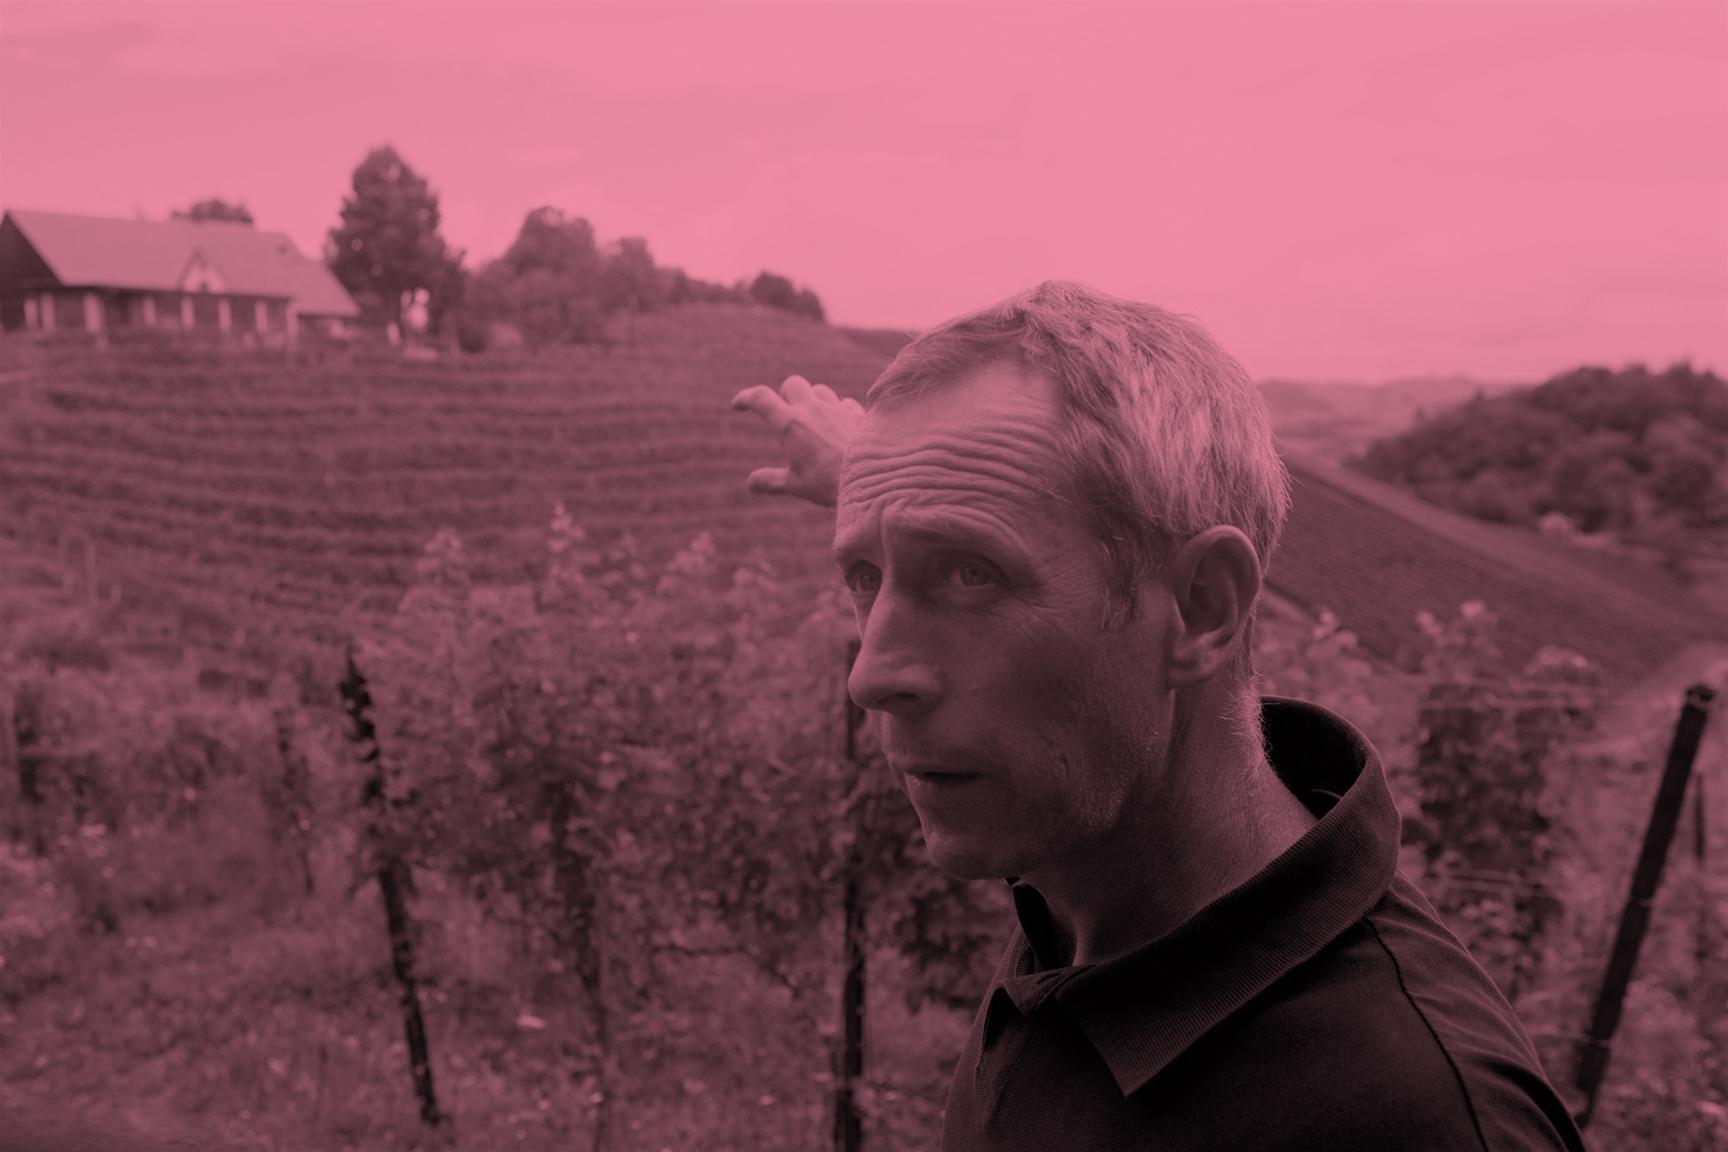 Andreas Tscheppe - Vinsupernaturel